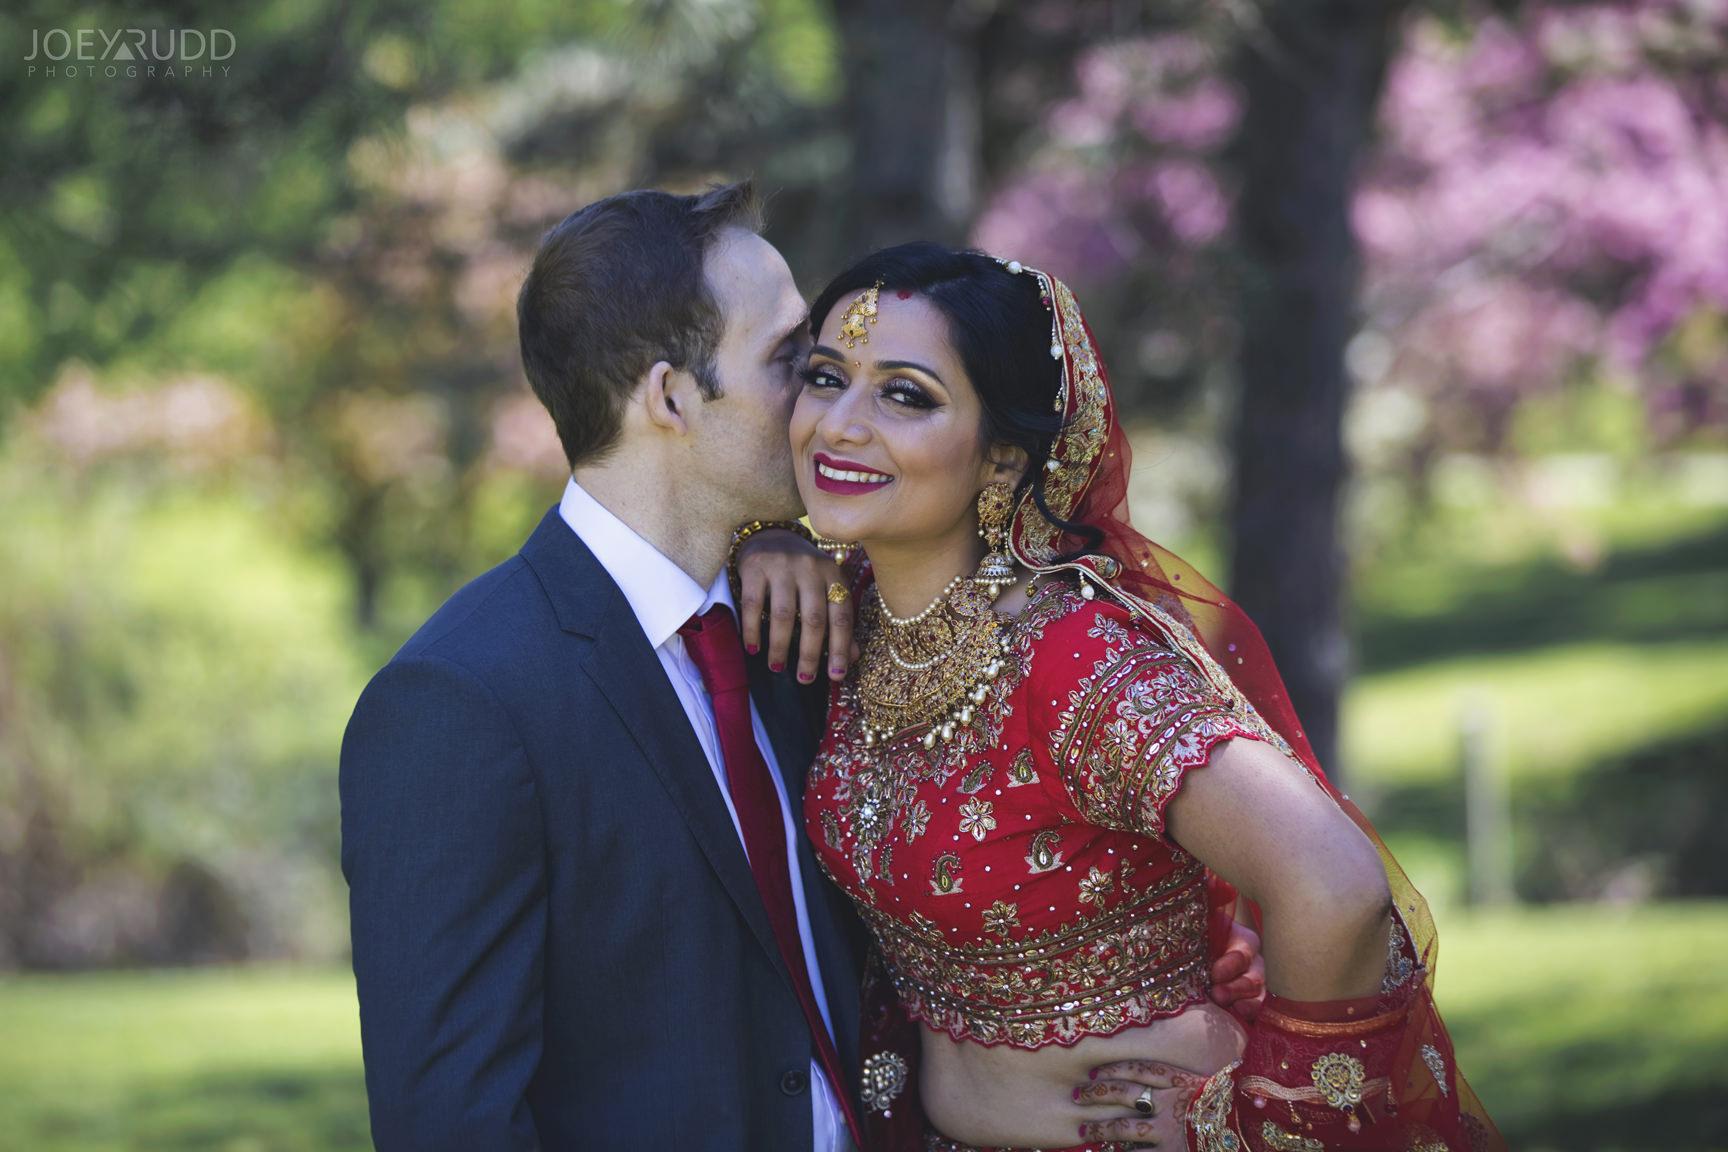 Ottawa Indian Wedding by Ottawa Wedding Photographer Joey Rudd Photography Andrew Haydon Park Cherry Blossoms